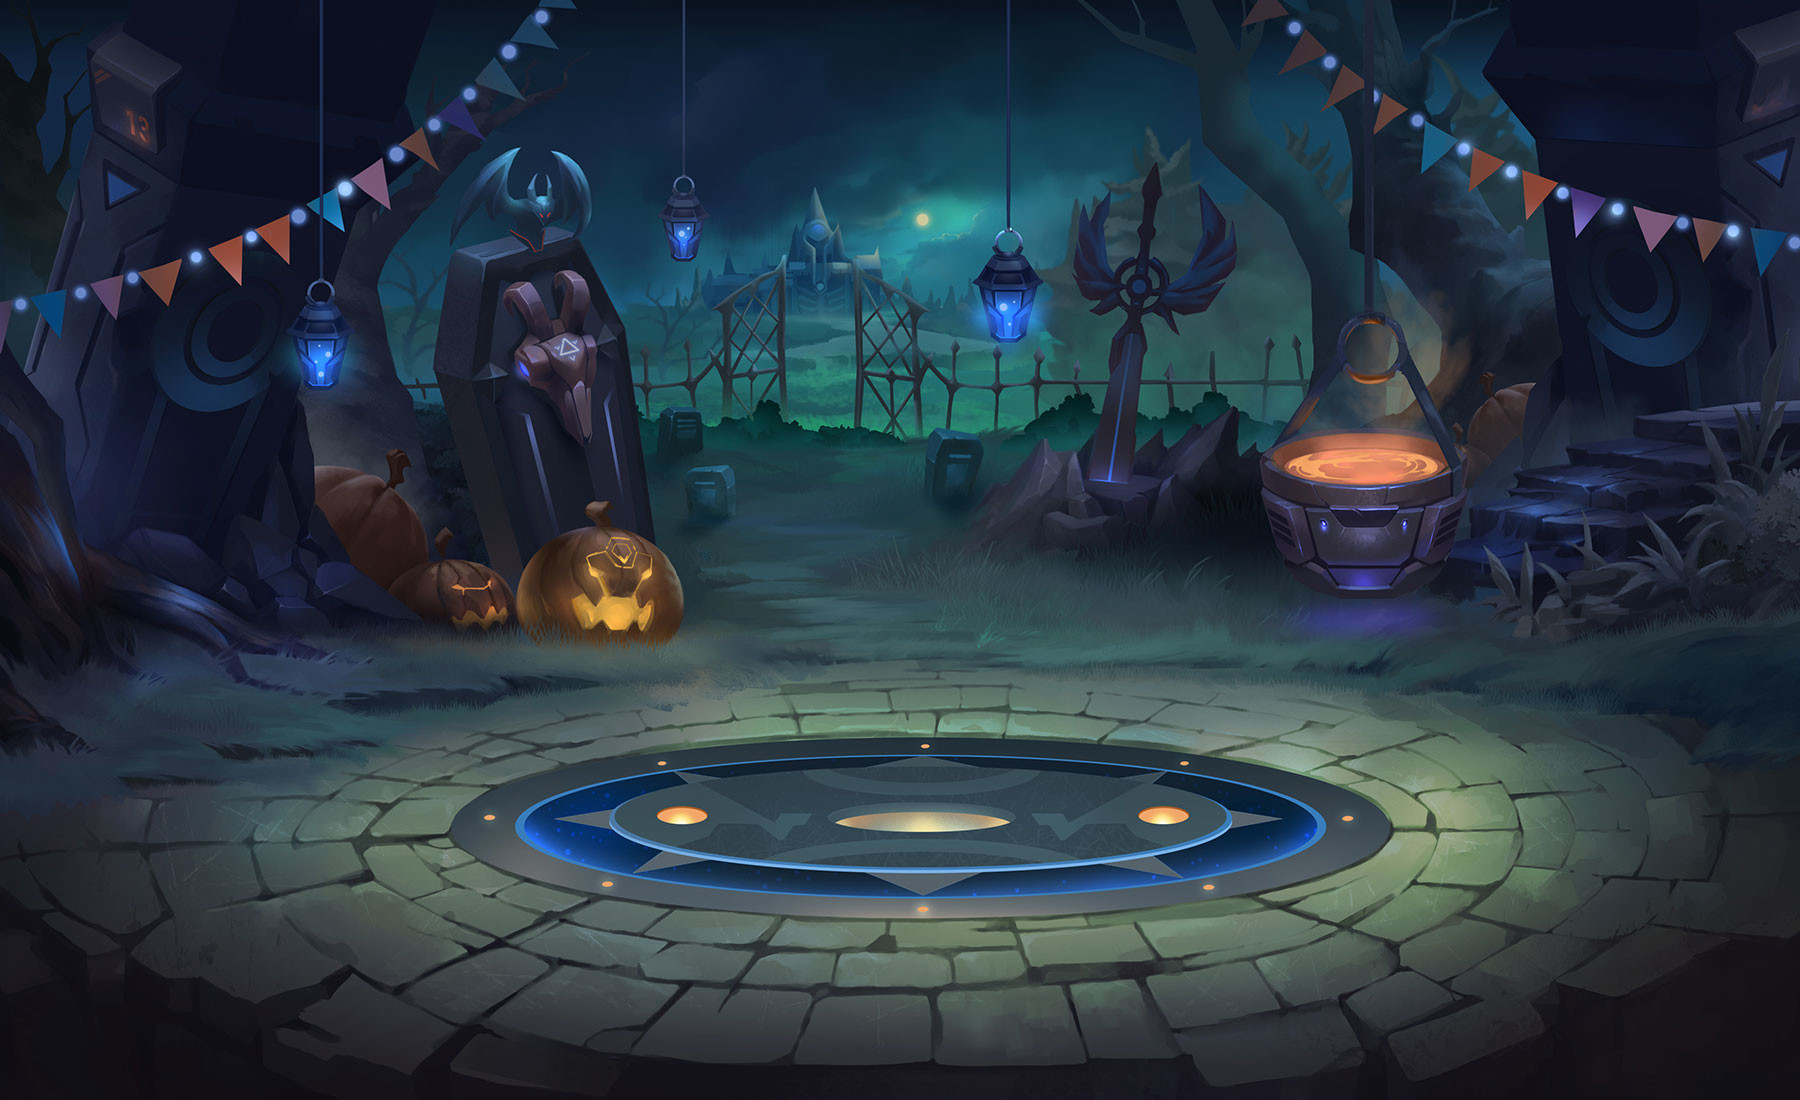 Trung nguyen bg halloween scale3